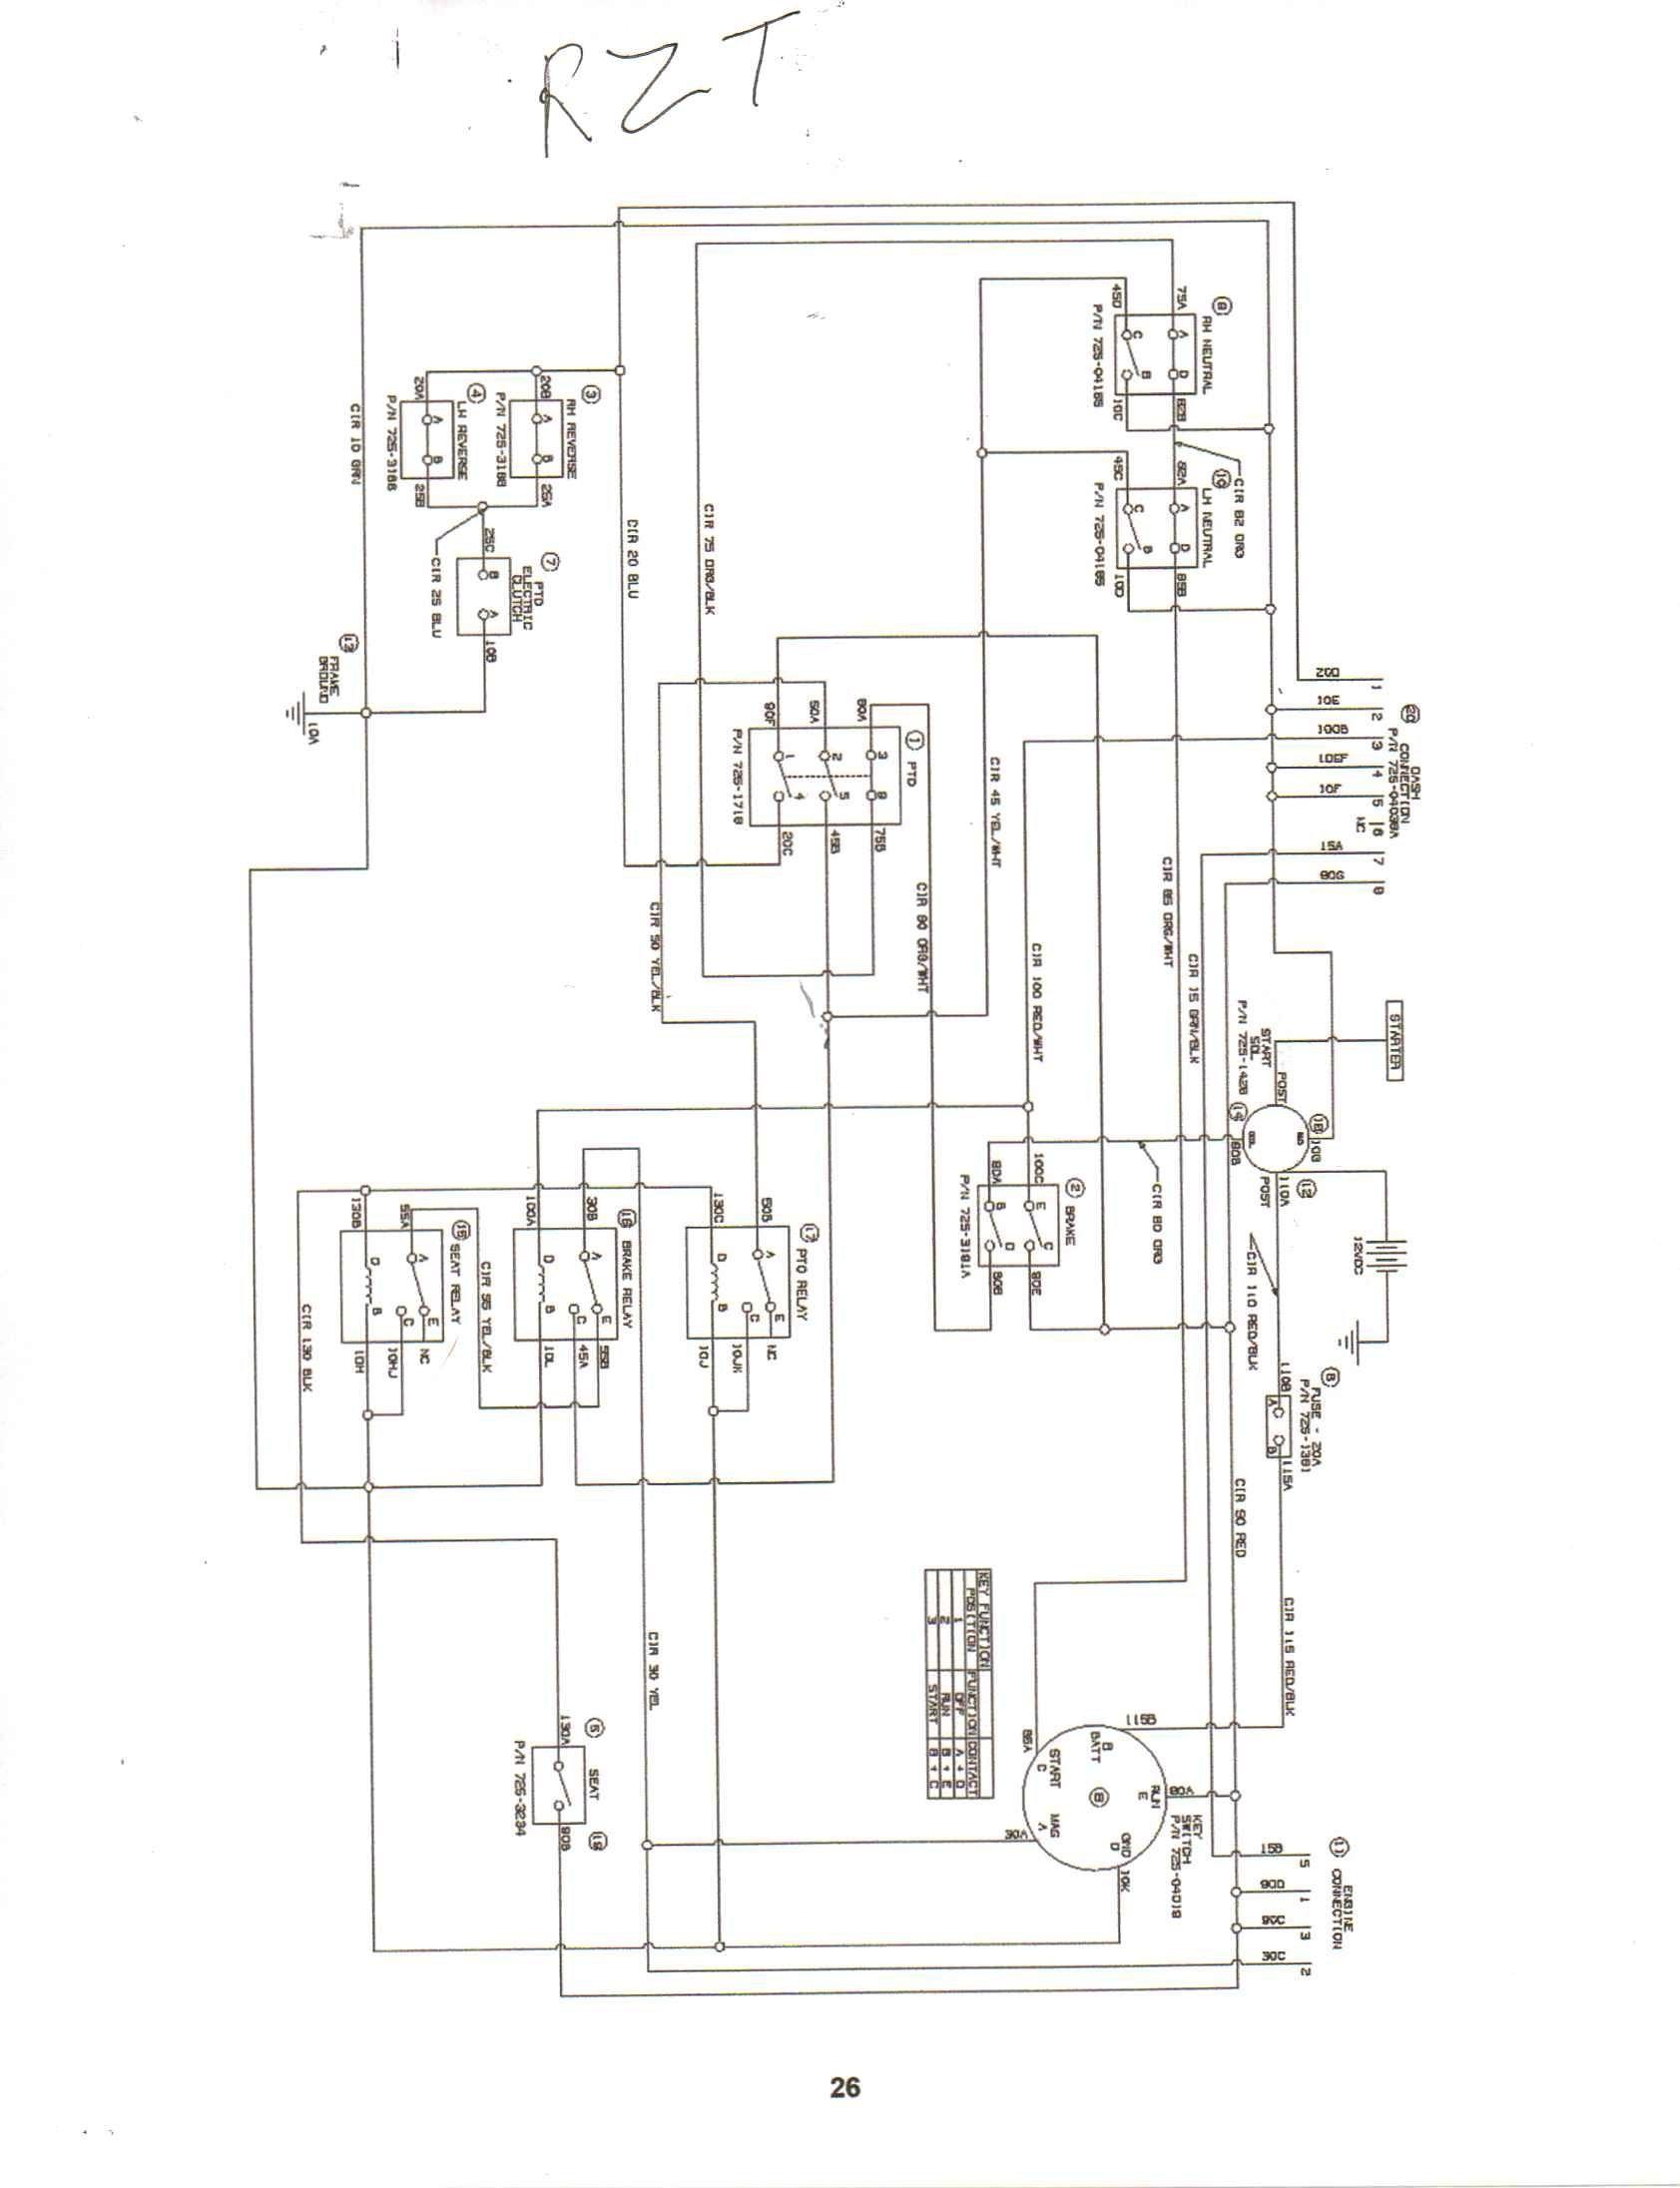 [SCHEMATICS_48ZD]  Rzt S 46 Wiring Diagram Sl500 Mercedes Benz Power Seat Wiring Diagram -  kucing-garong-27.sardaracomunitaospitale.it | Cub Cadet W600 Wiring Diagram |  | Wiring Diagram and Schematics